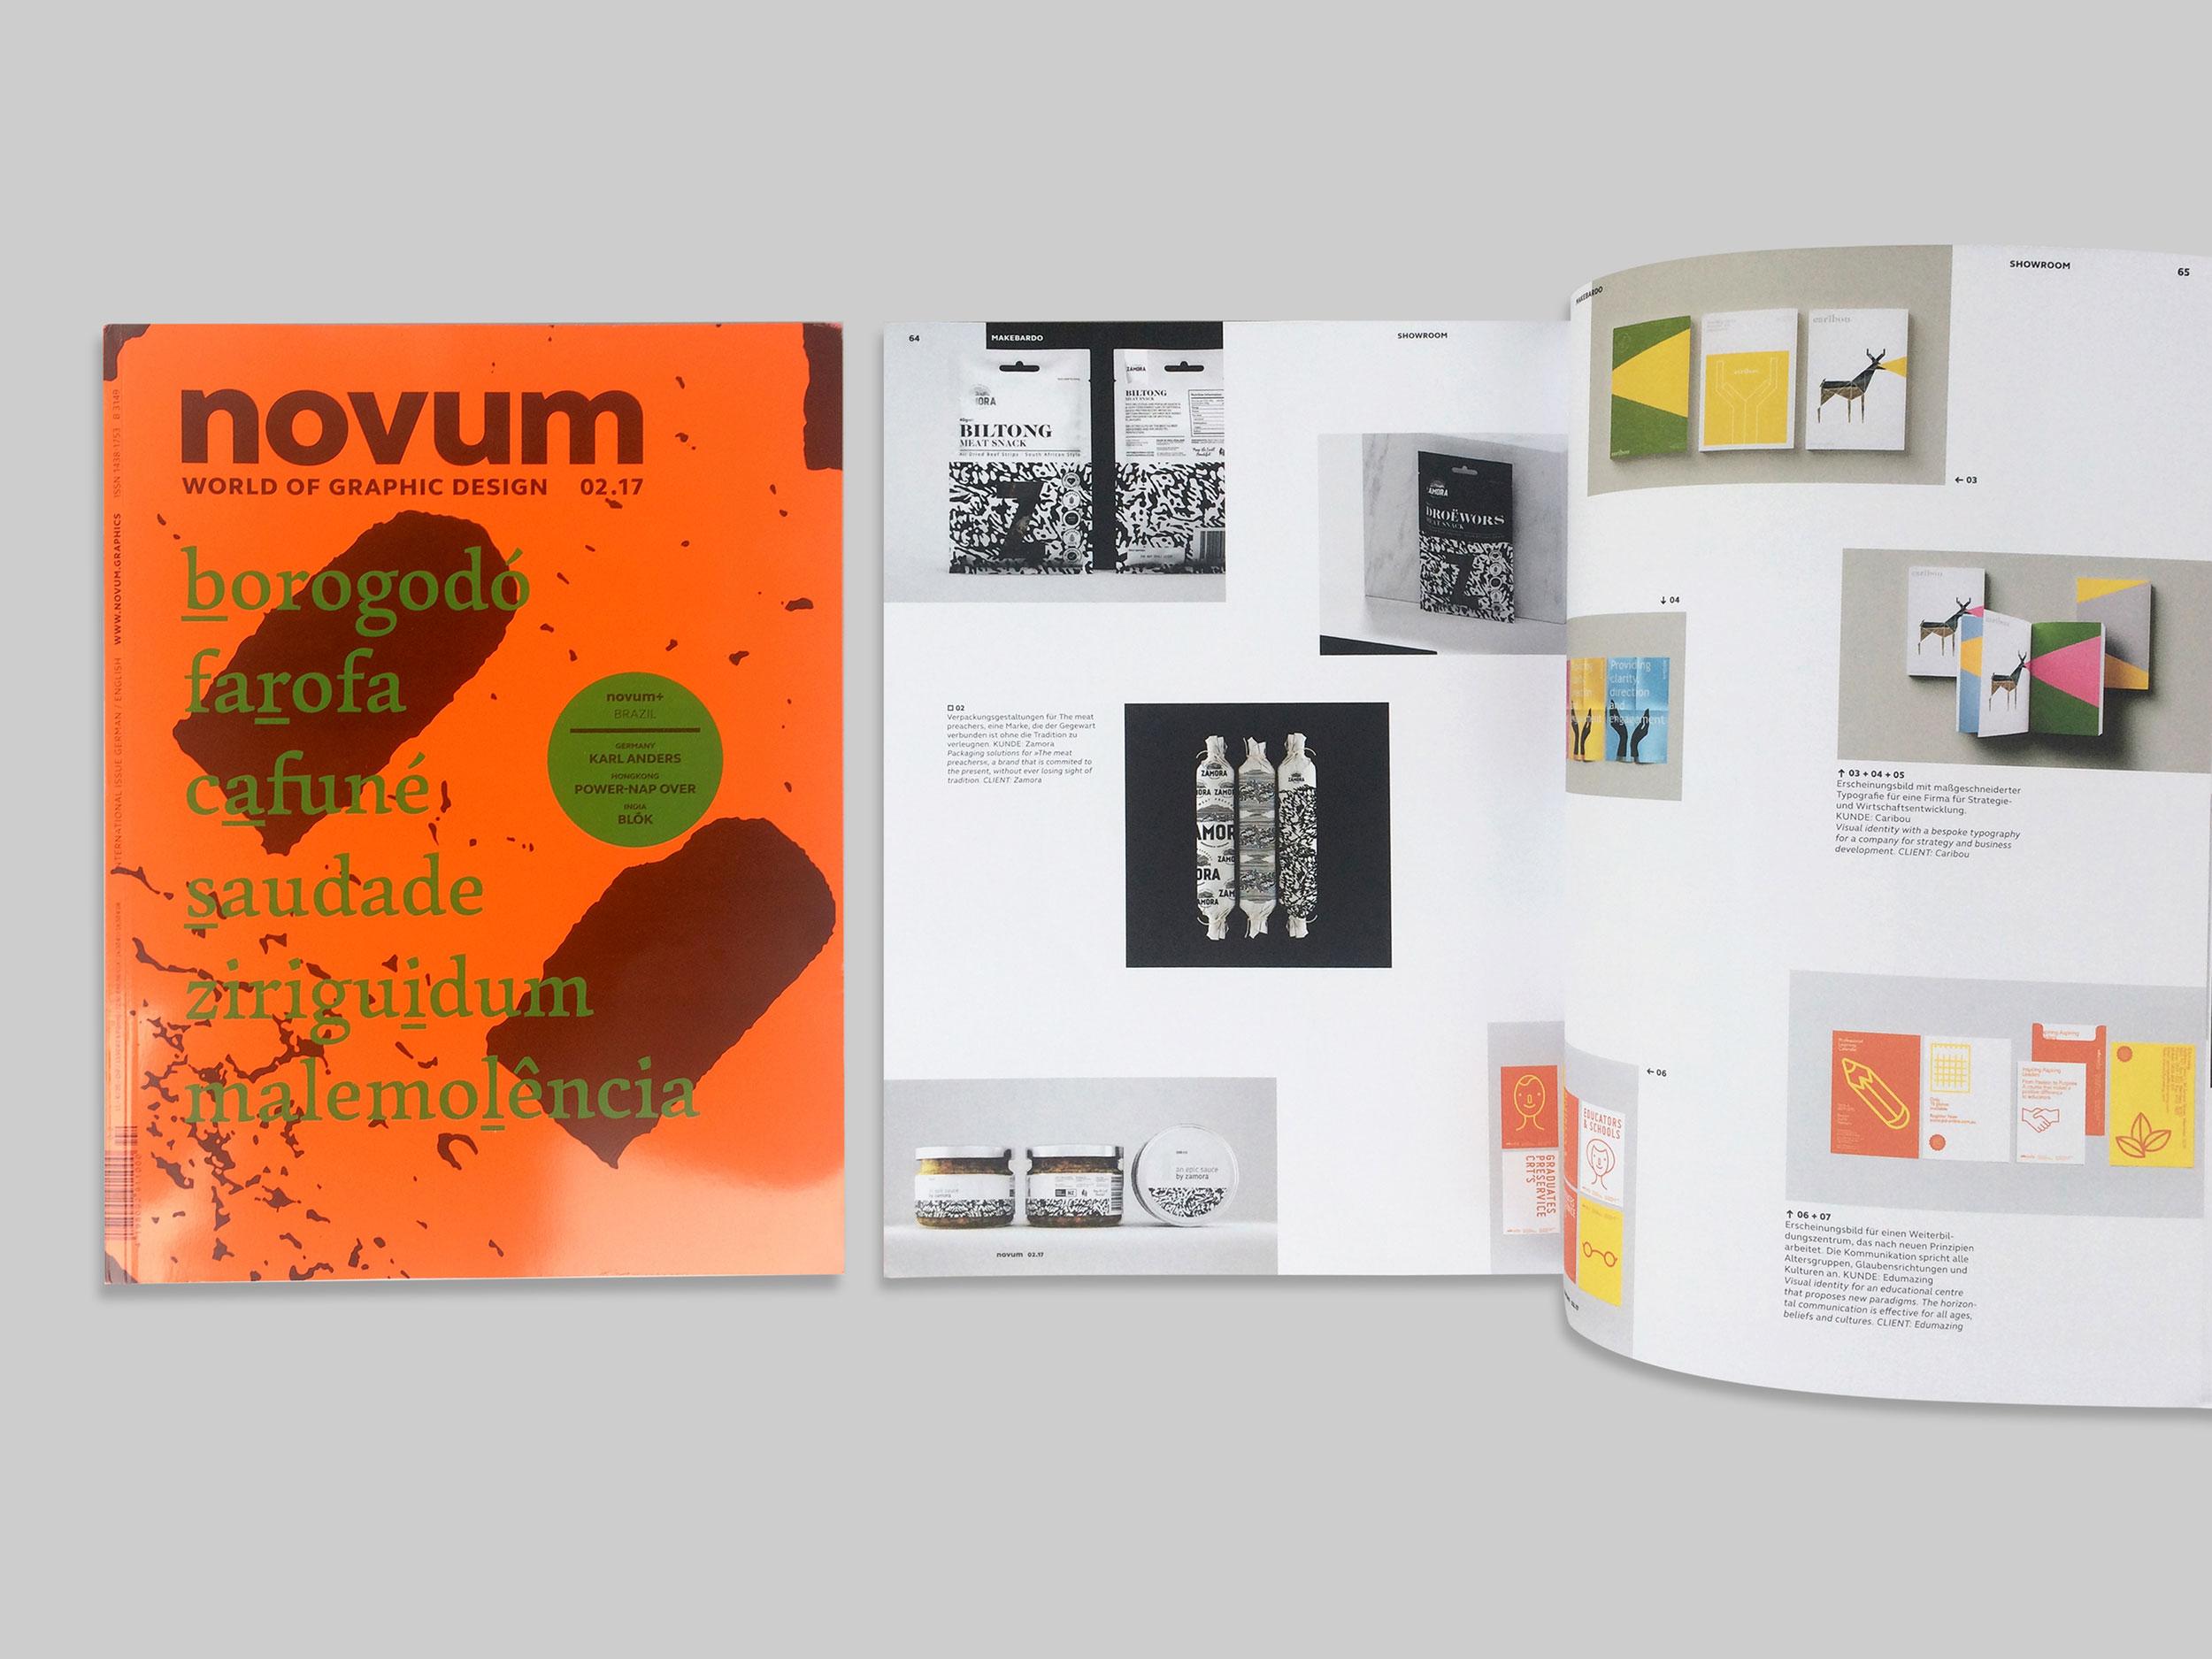 makebardo_Novum-Magazine_02_17_05.jpg